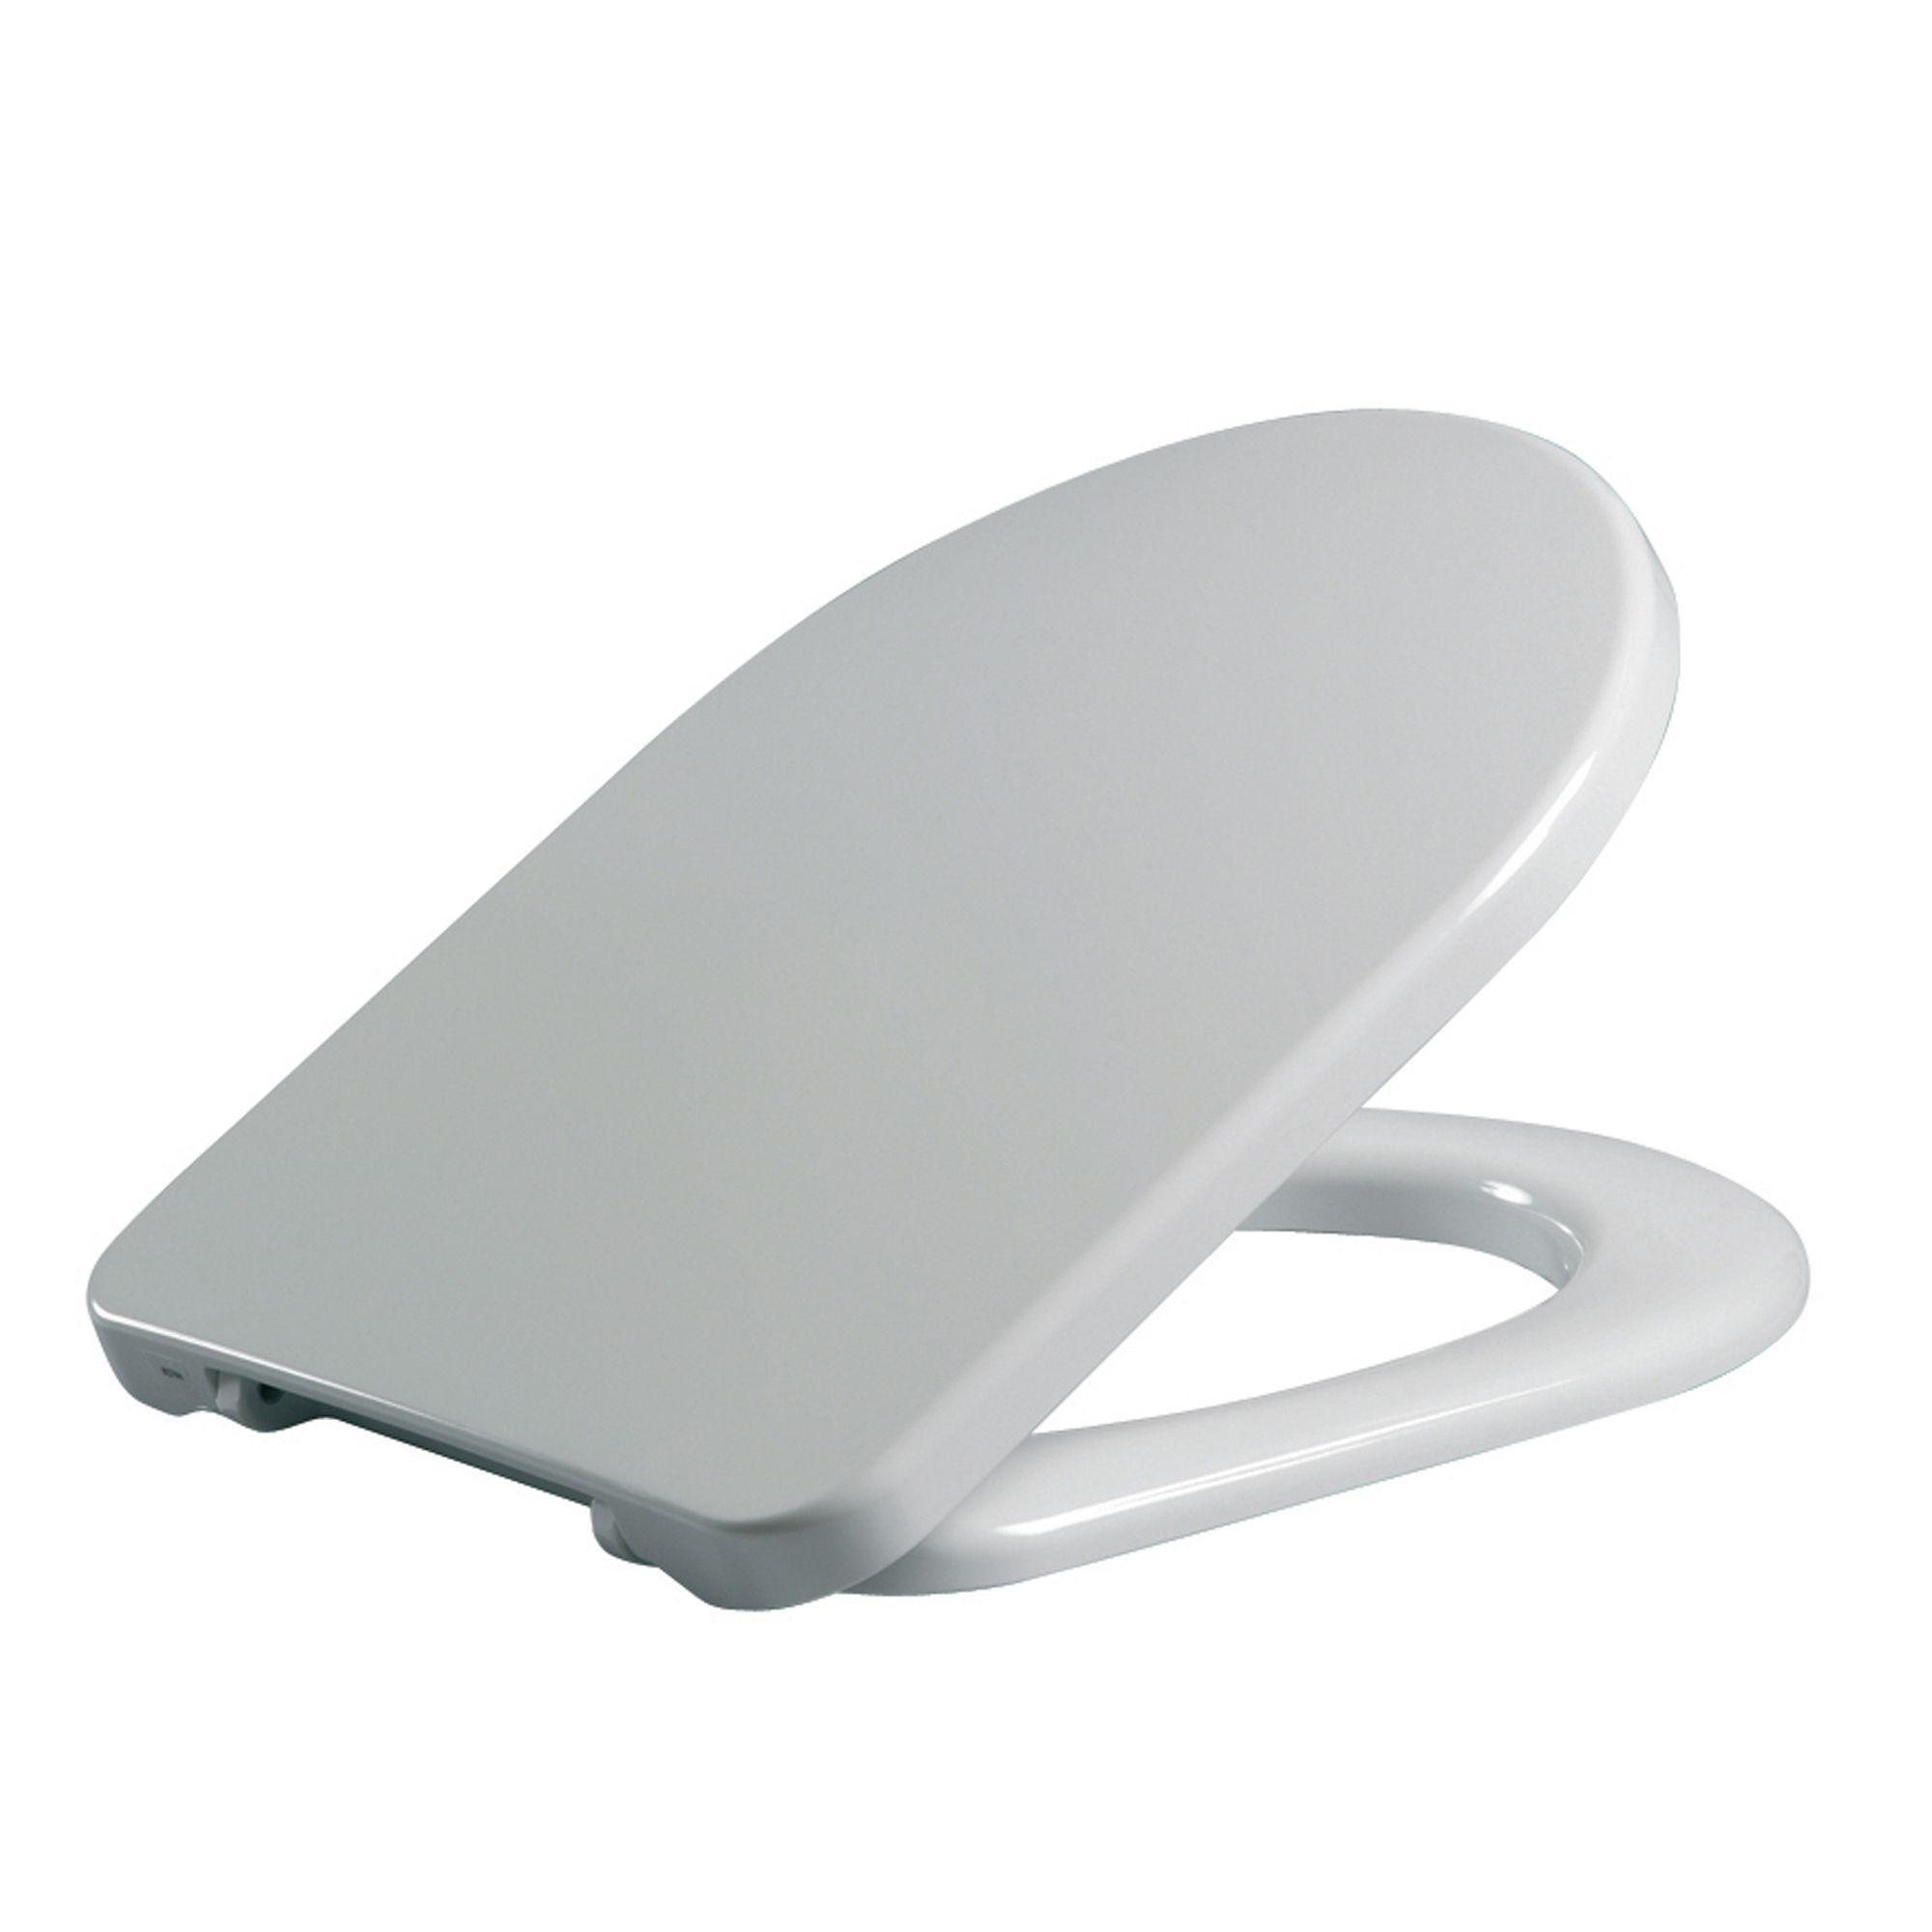 Prime Cedo Sorrel White Toilet Seat Departments Diy At Bq Creativecarmelina Interior Chair Design Creativecarmelinacom